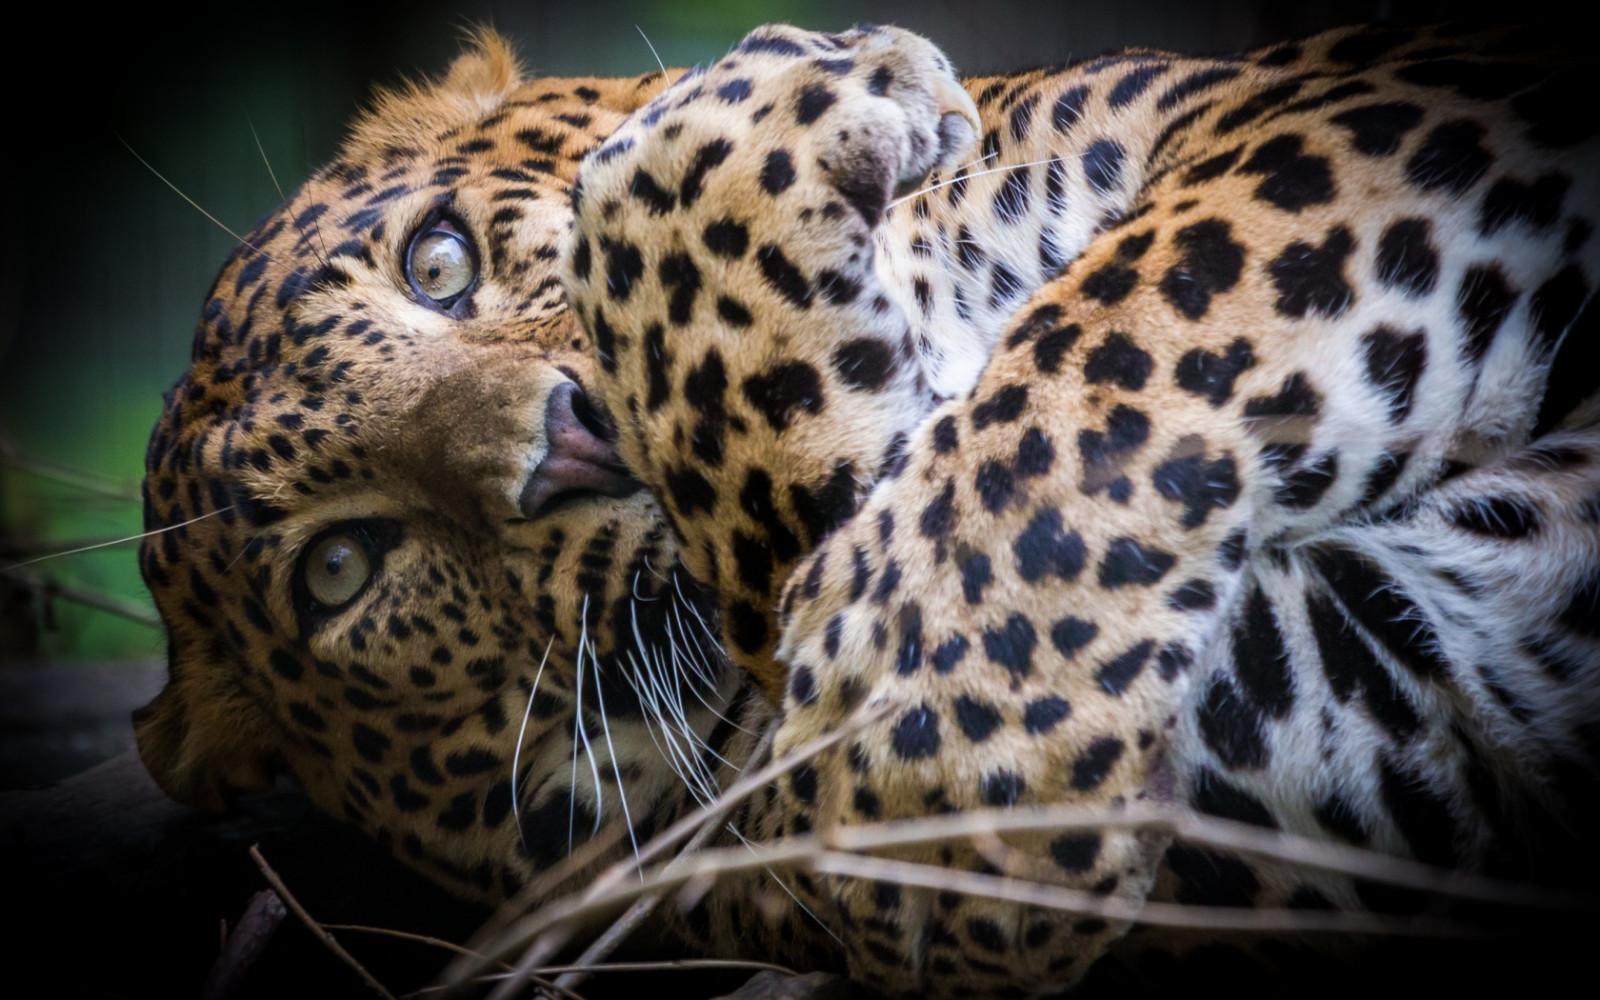 wildlife big cats whiskers leopard Ocelot Jaguar paws predator fauna mammal vertebrate close up cat like mammal muzzle